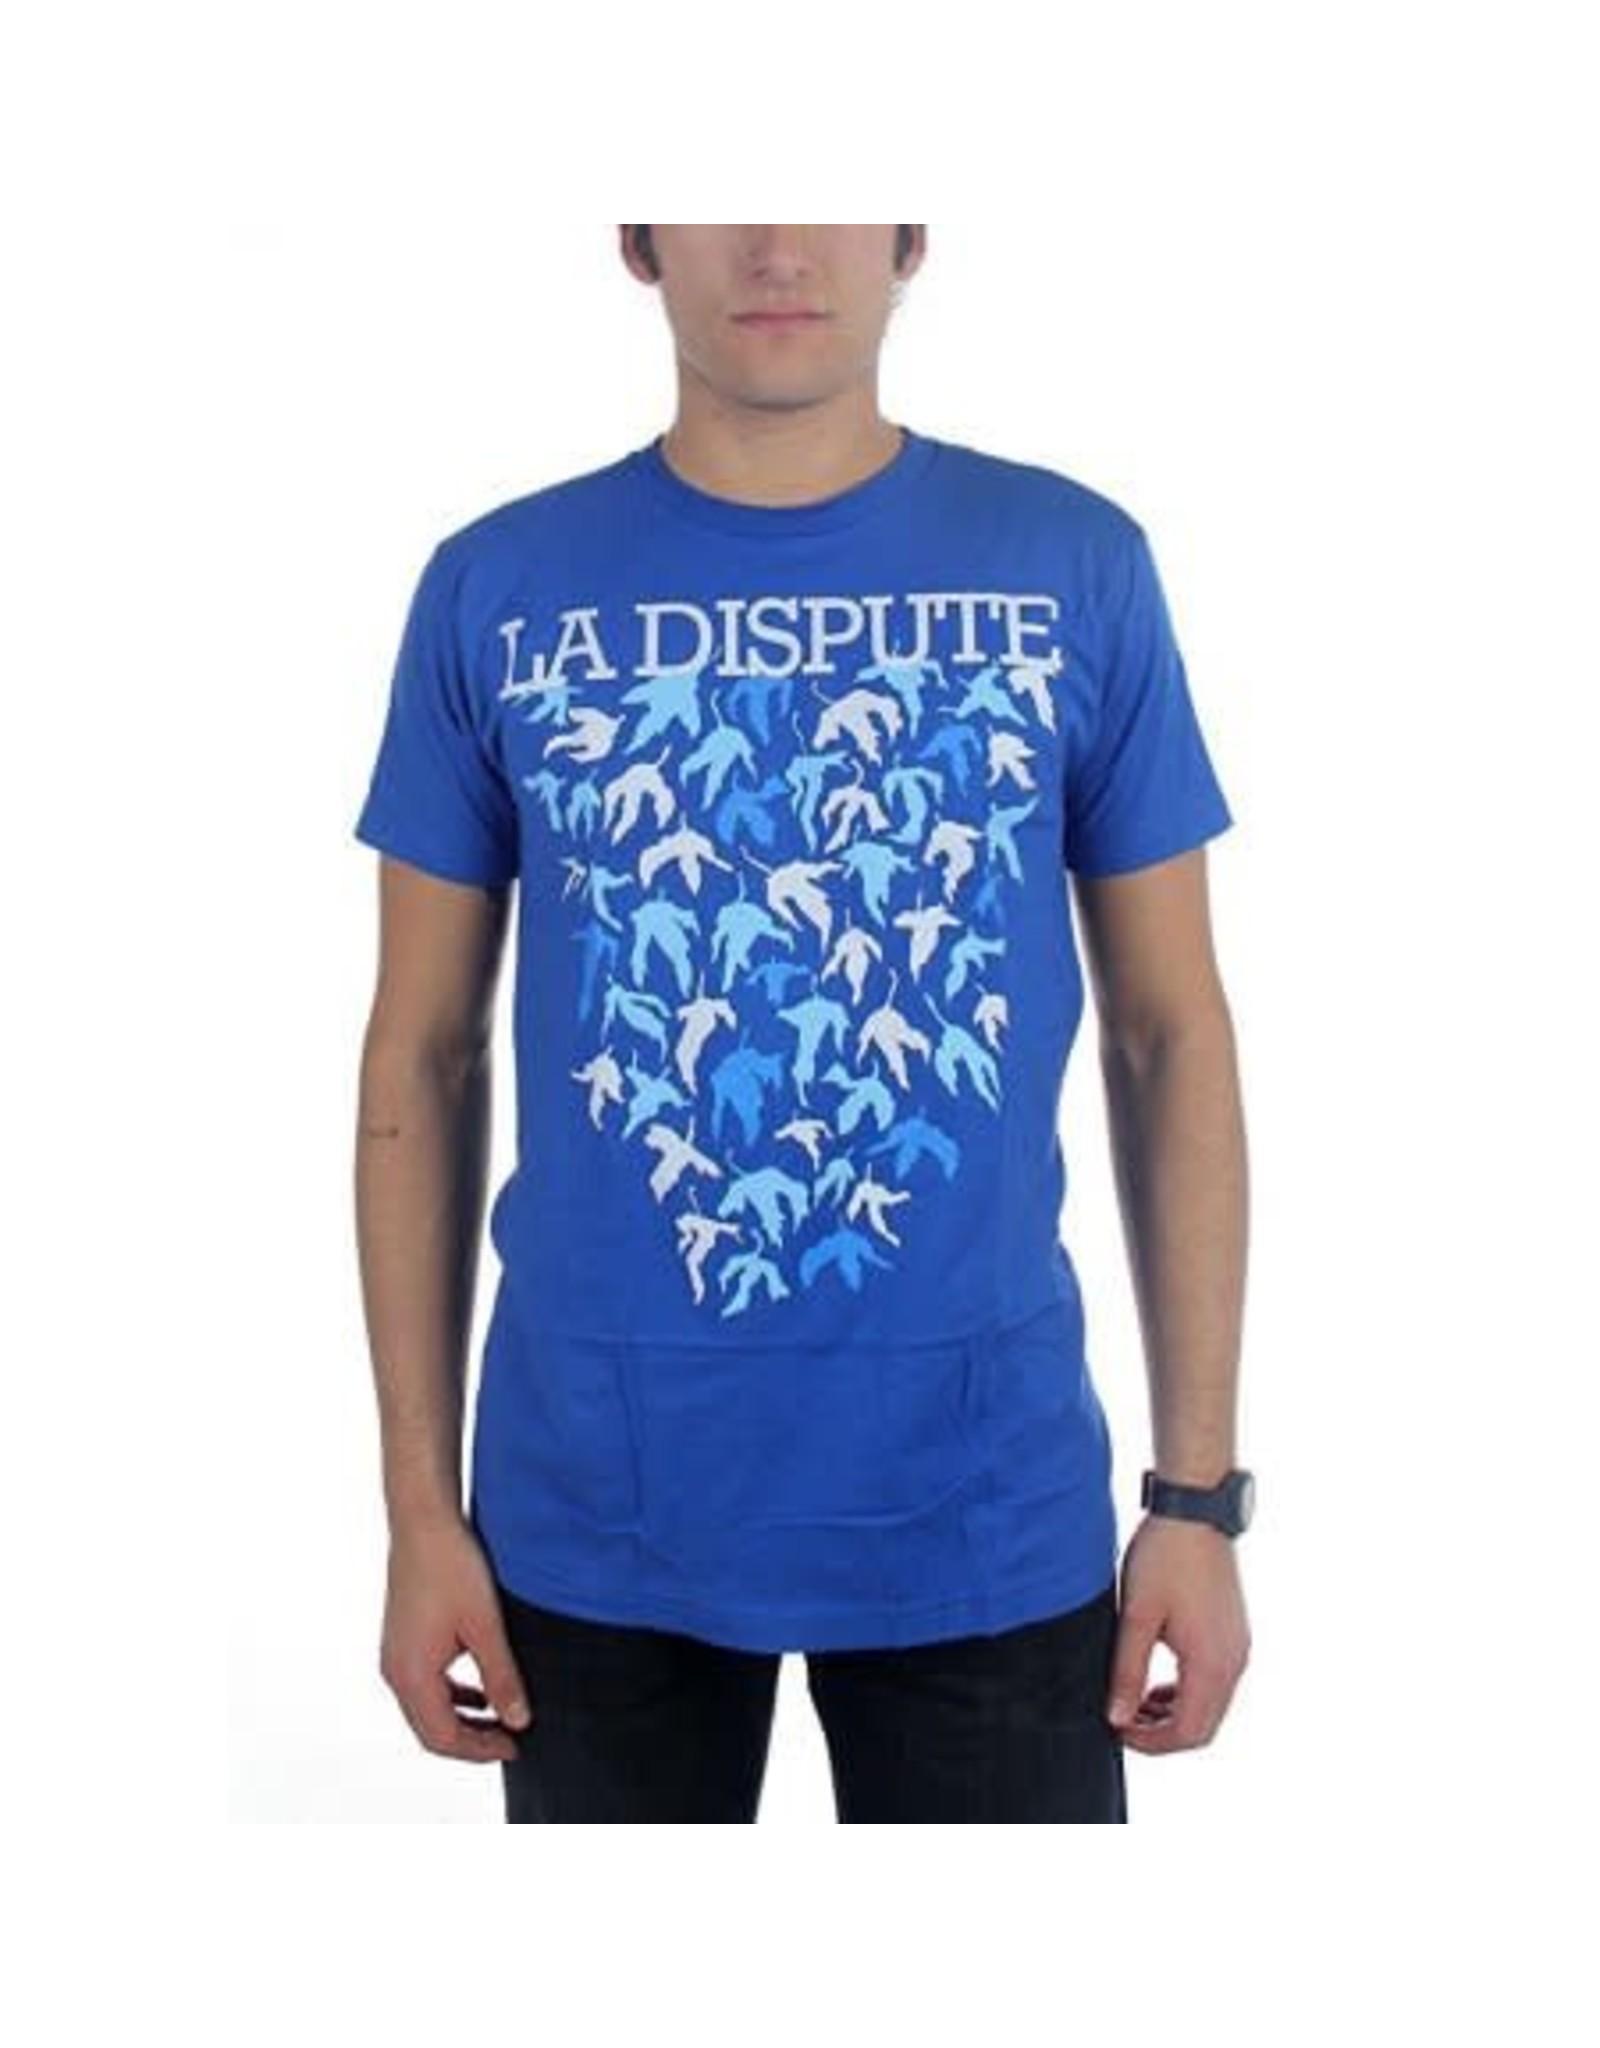 La Dispute Leaves T-Shirt